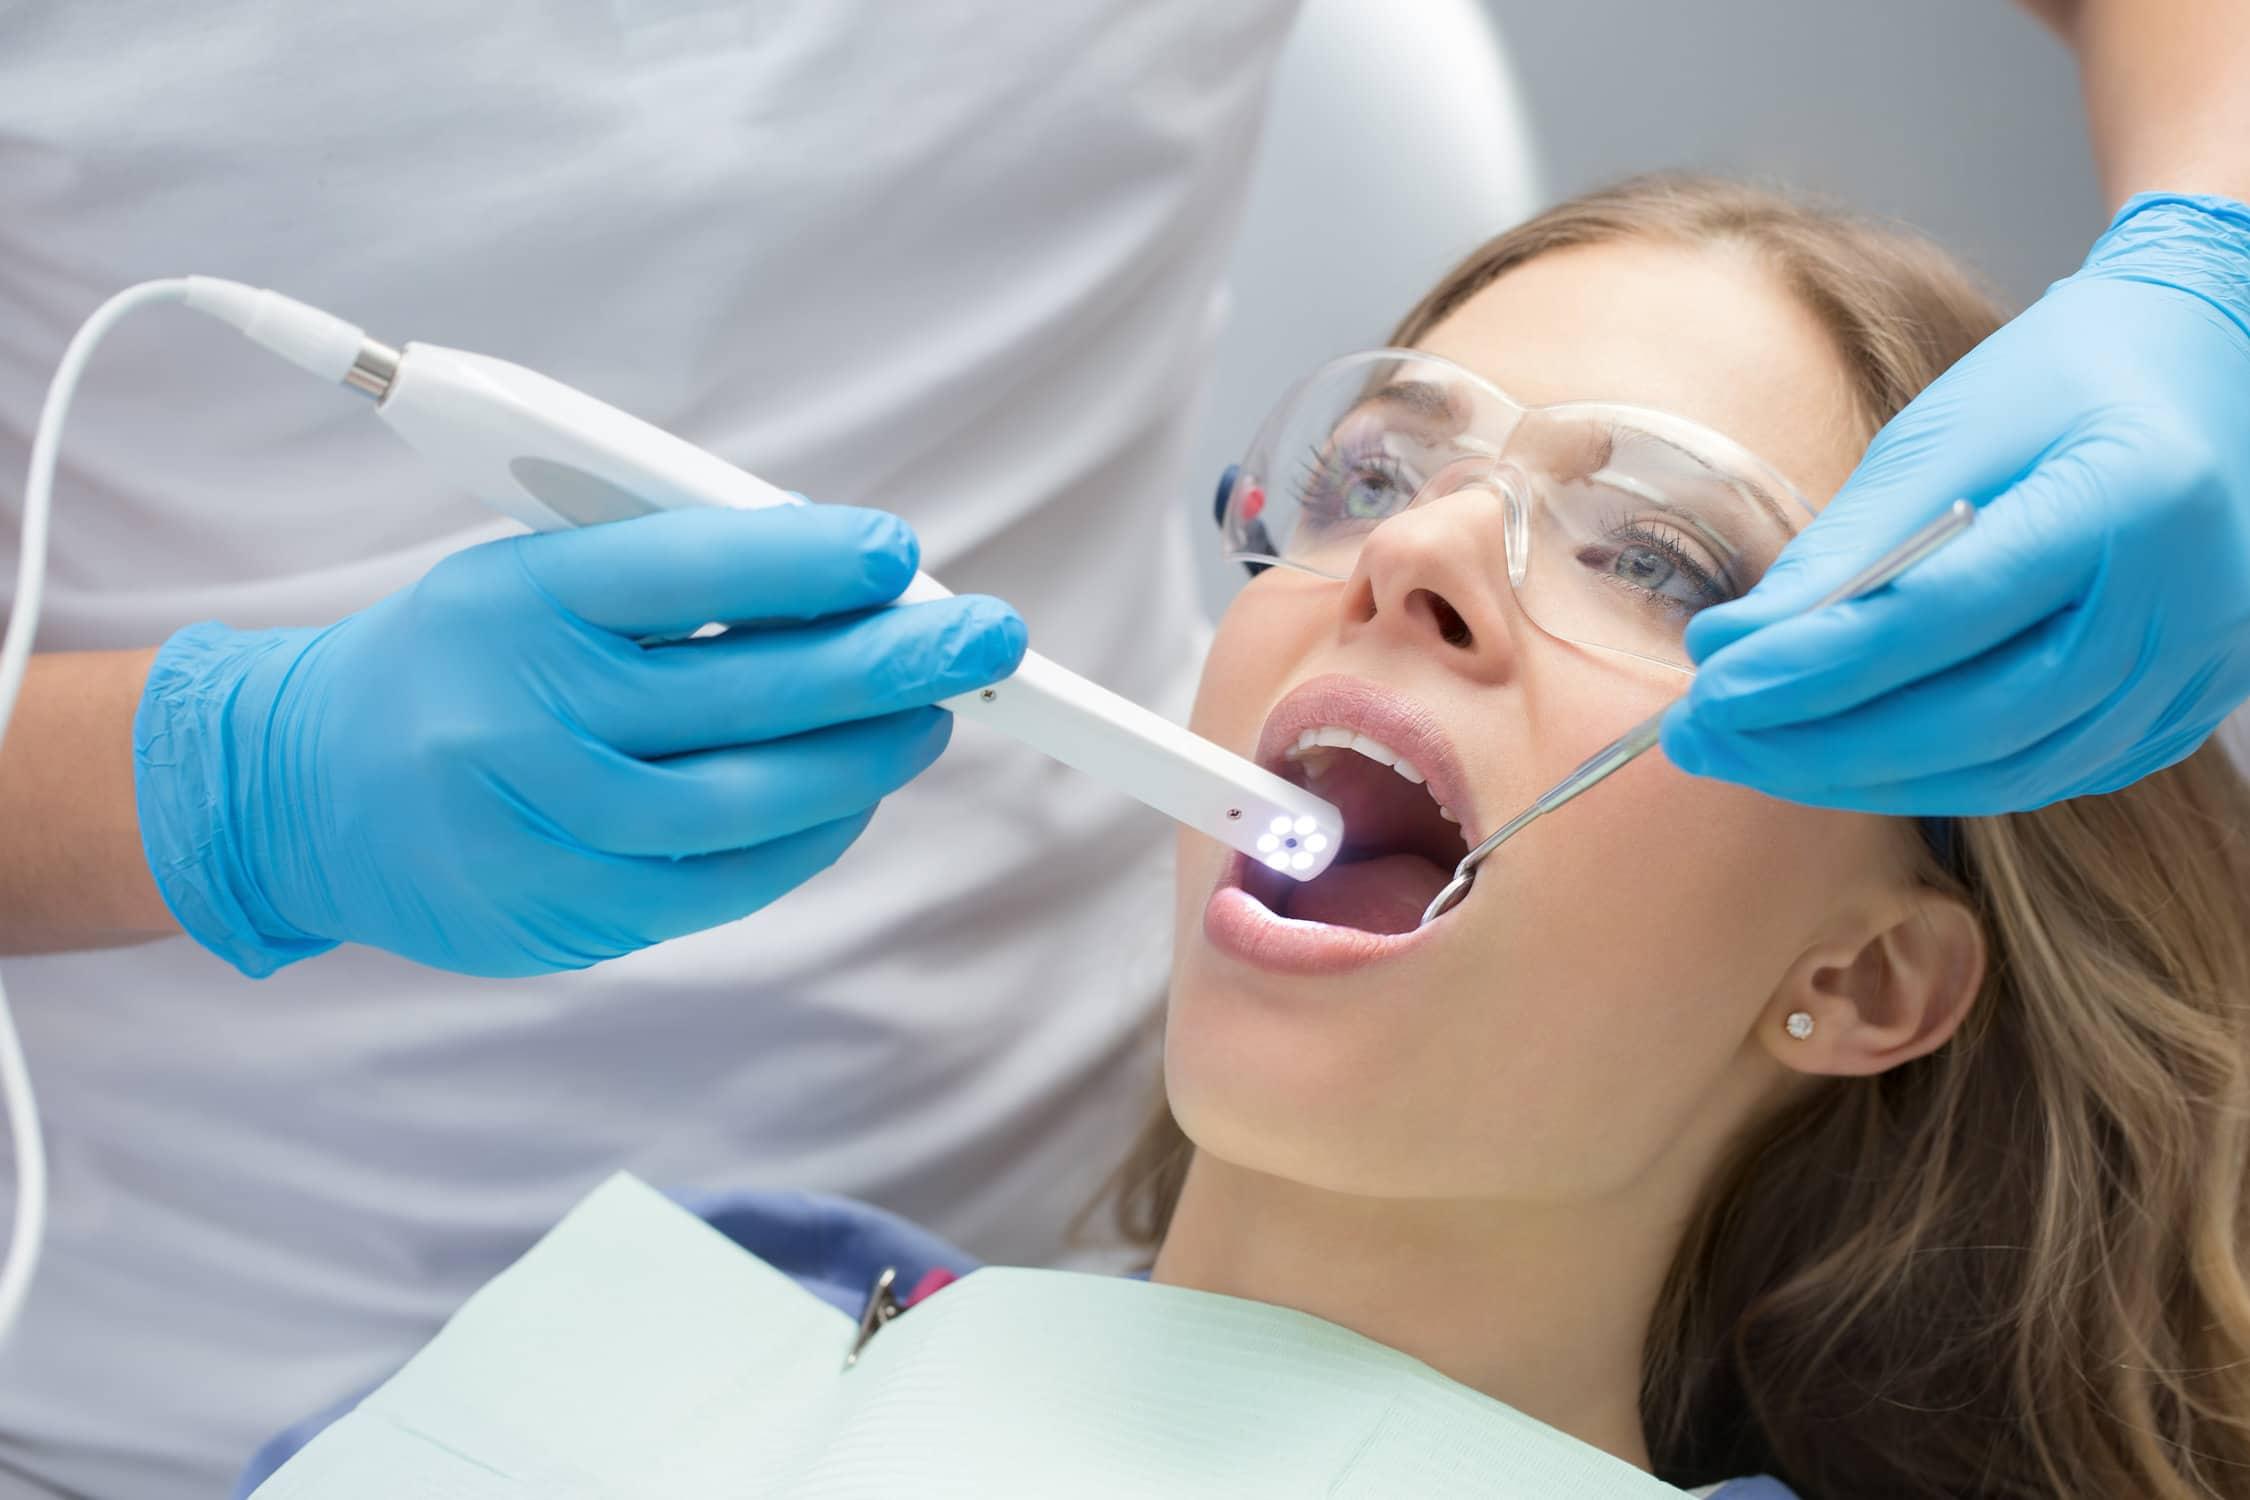 Dental technology - Intraoral camera